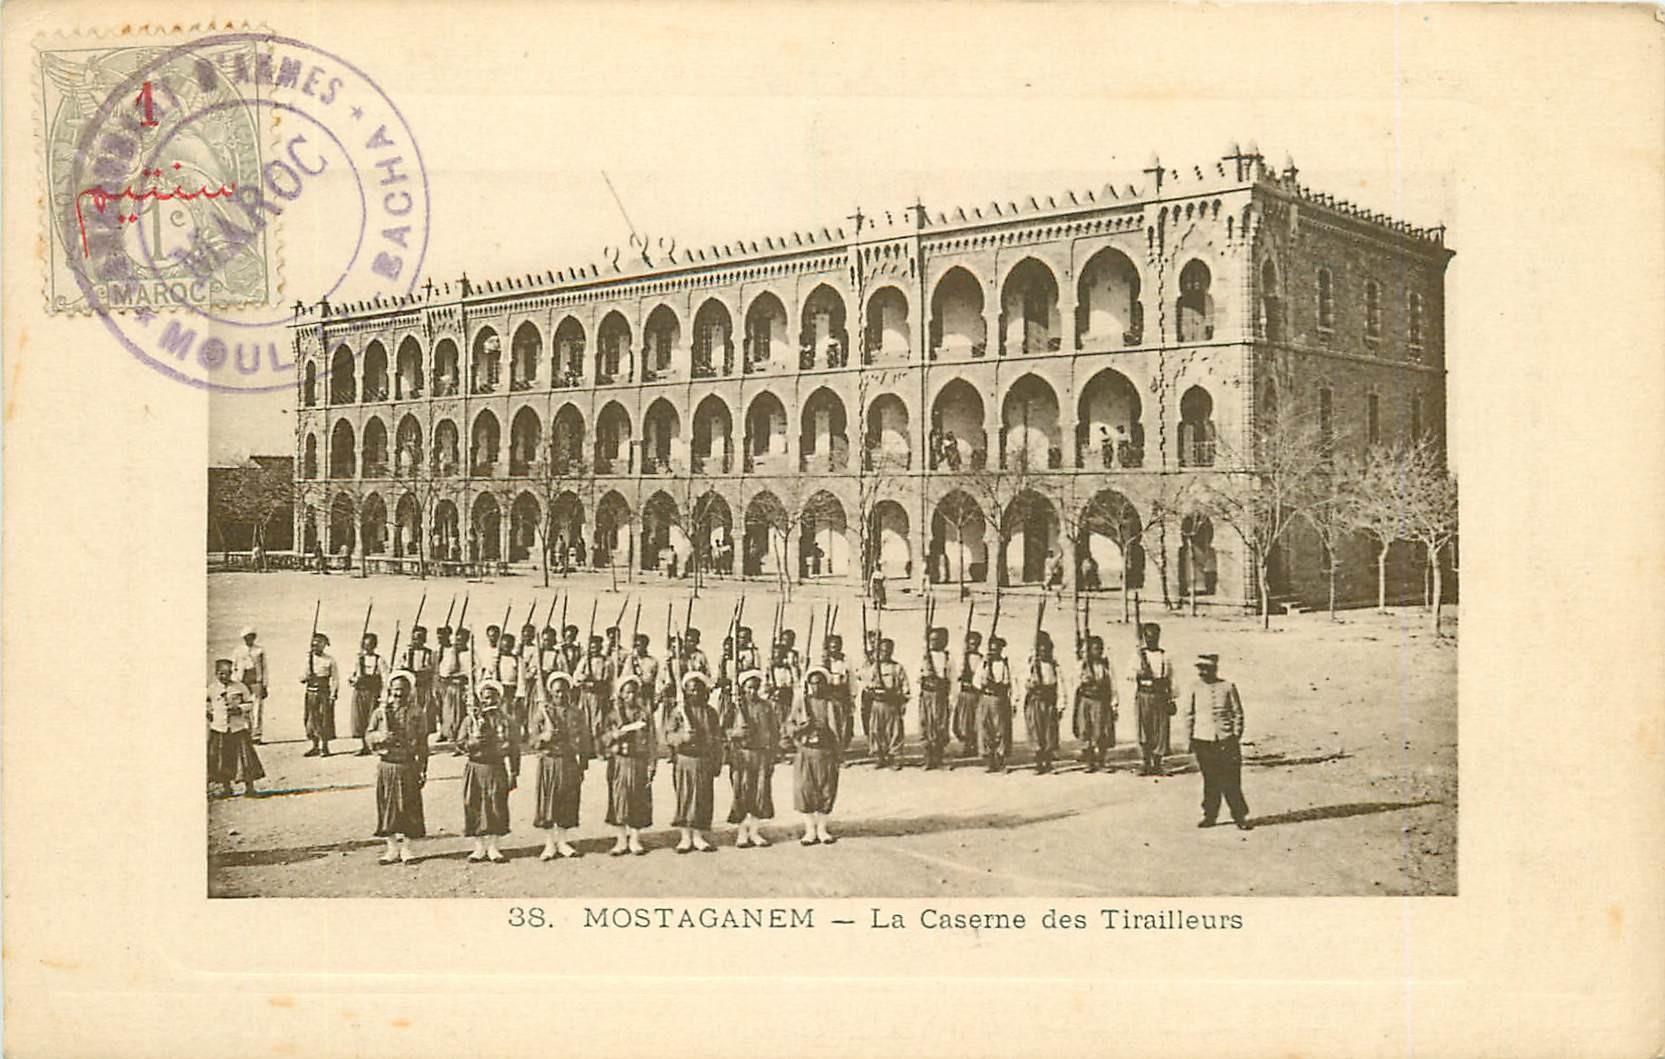 WW MOSTAGANEM. La Caserne des Tirailleurs au Maroc